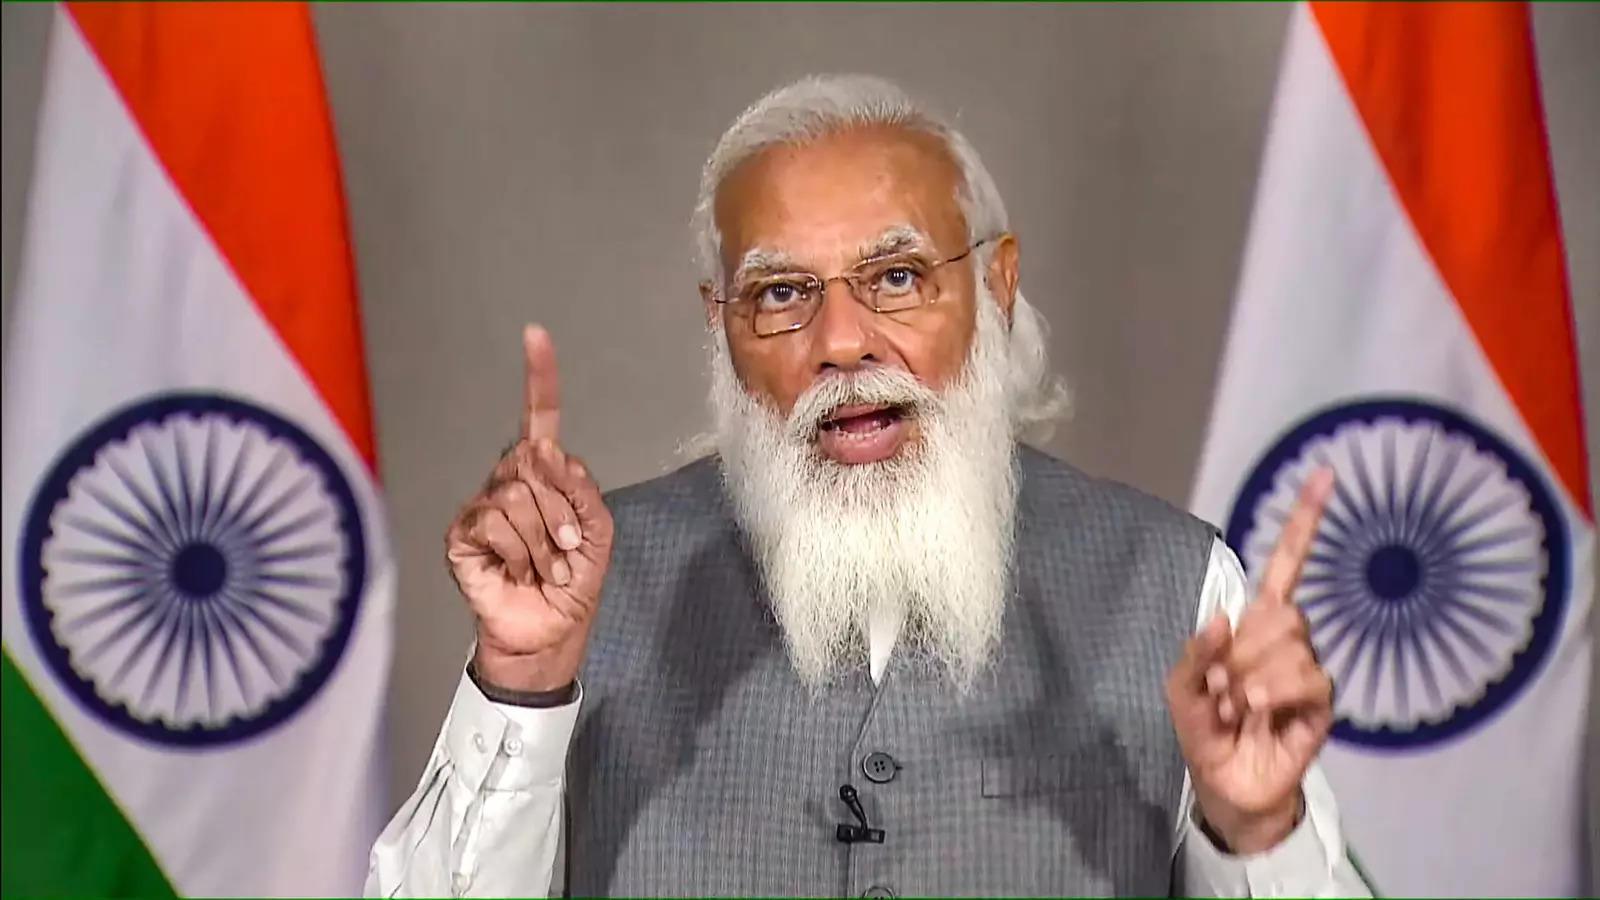 PM Modi announces launch of M-Yoga app to expand yoga across globe